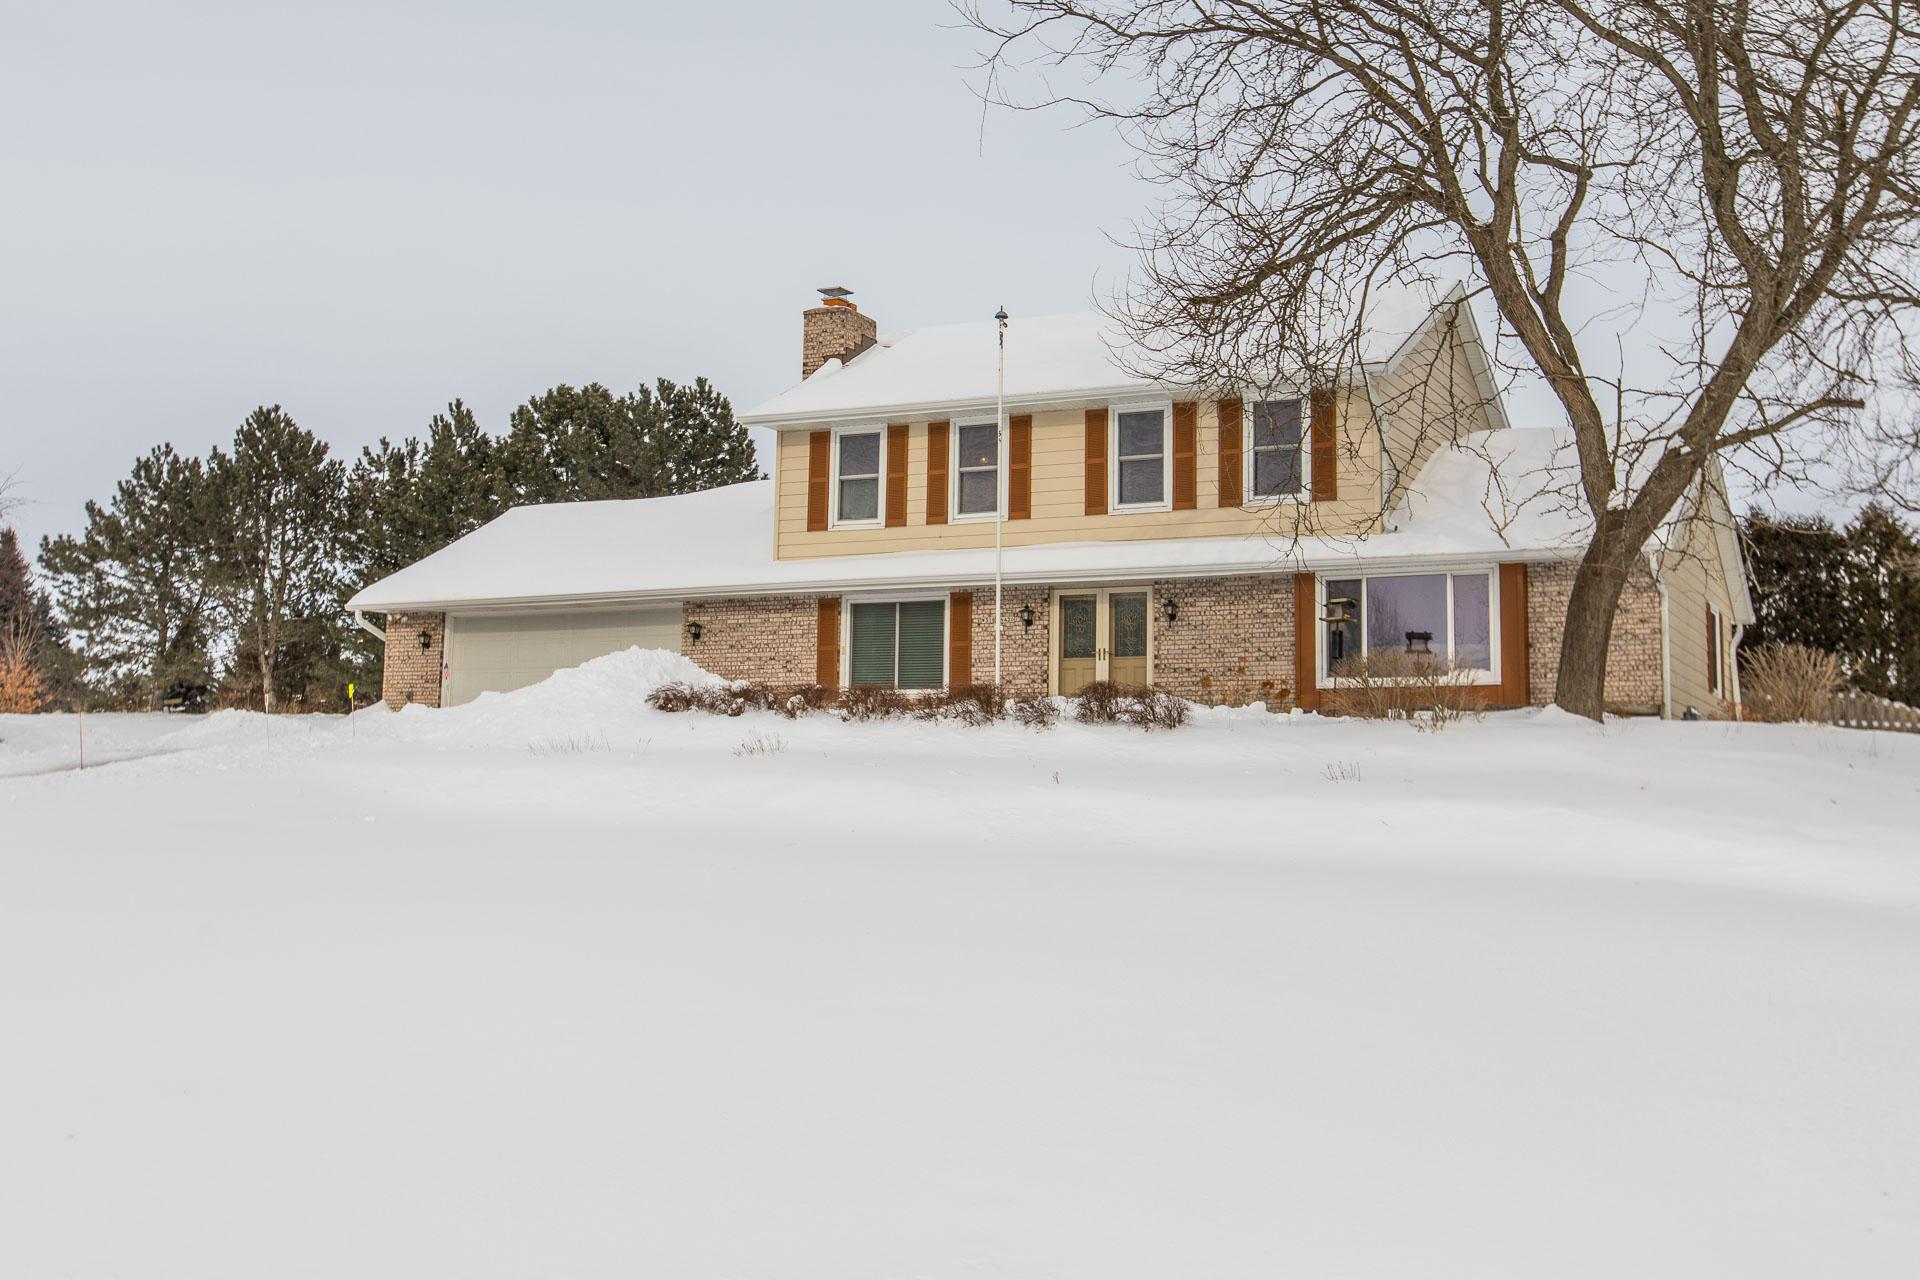 W316N420 Huckleberry Way, Delafield, Wisconsin 53018, 3 Bedrooms Bedrooms, 7 Rooms Rooms,1 BathroomBathrooms,Single-Family,For Sale,Huckleberry Way,1622117